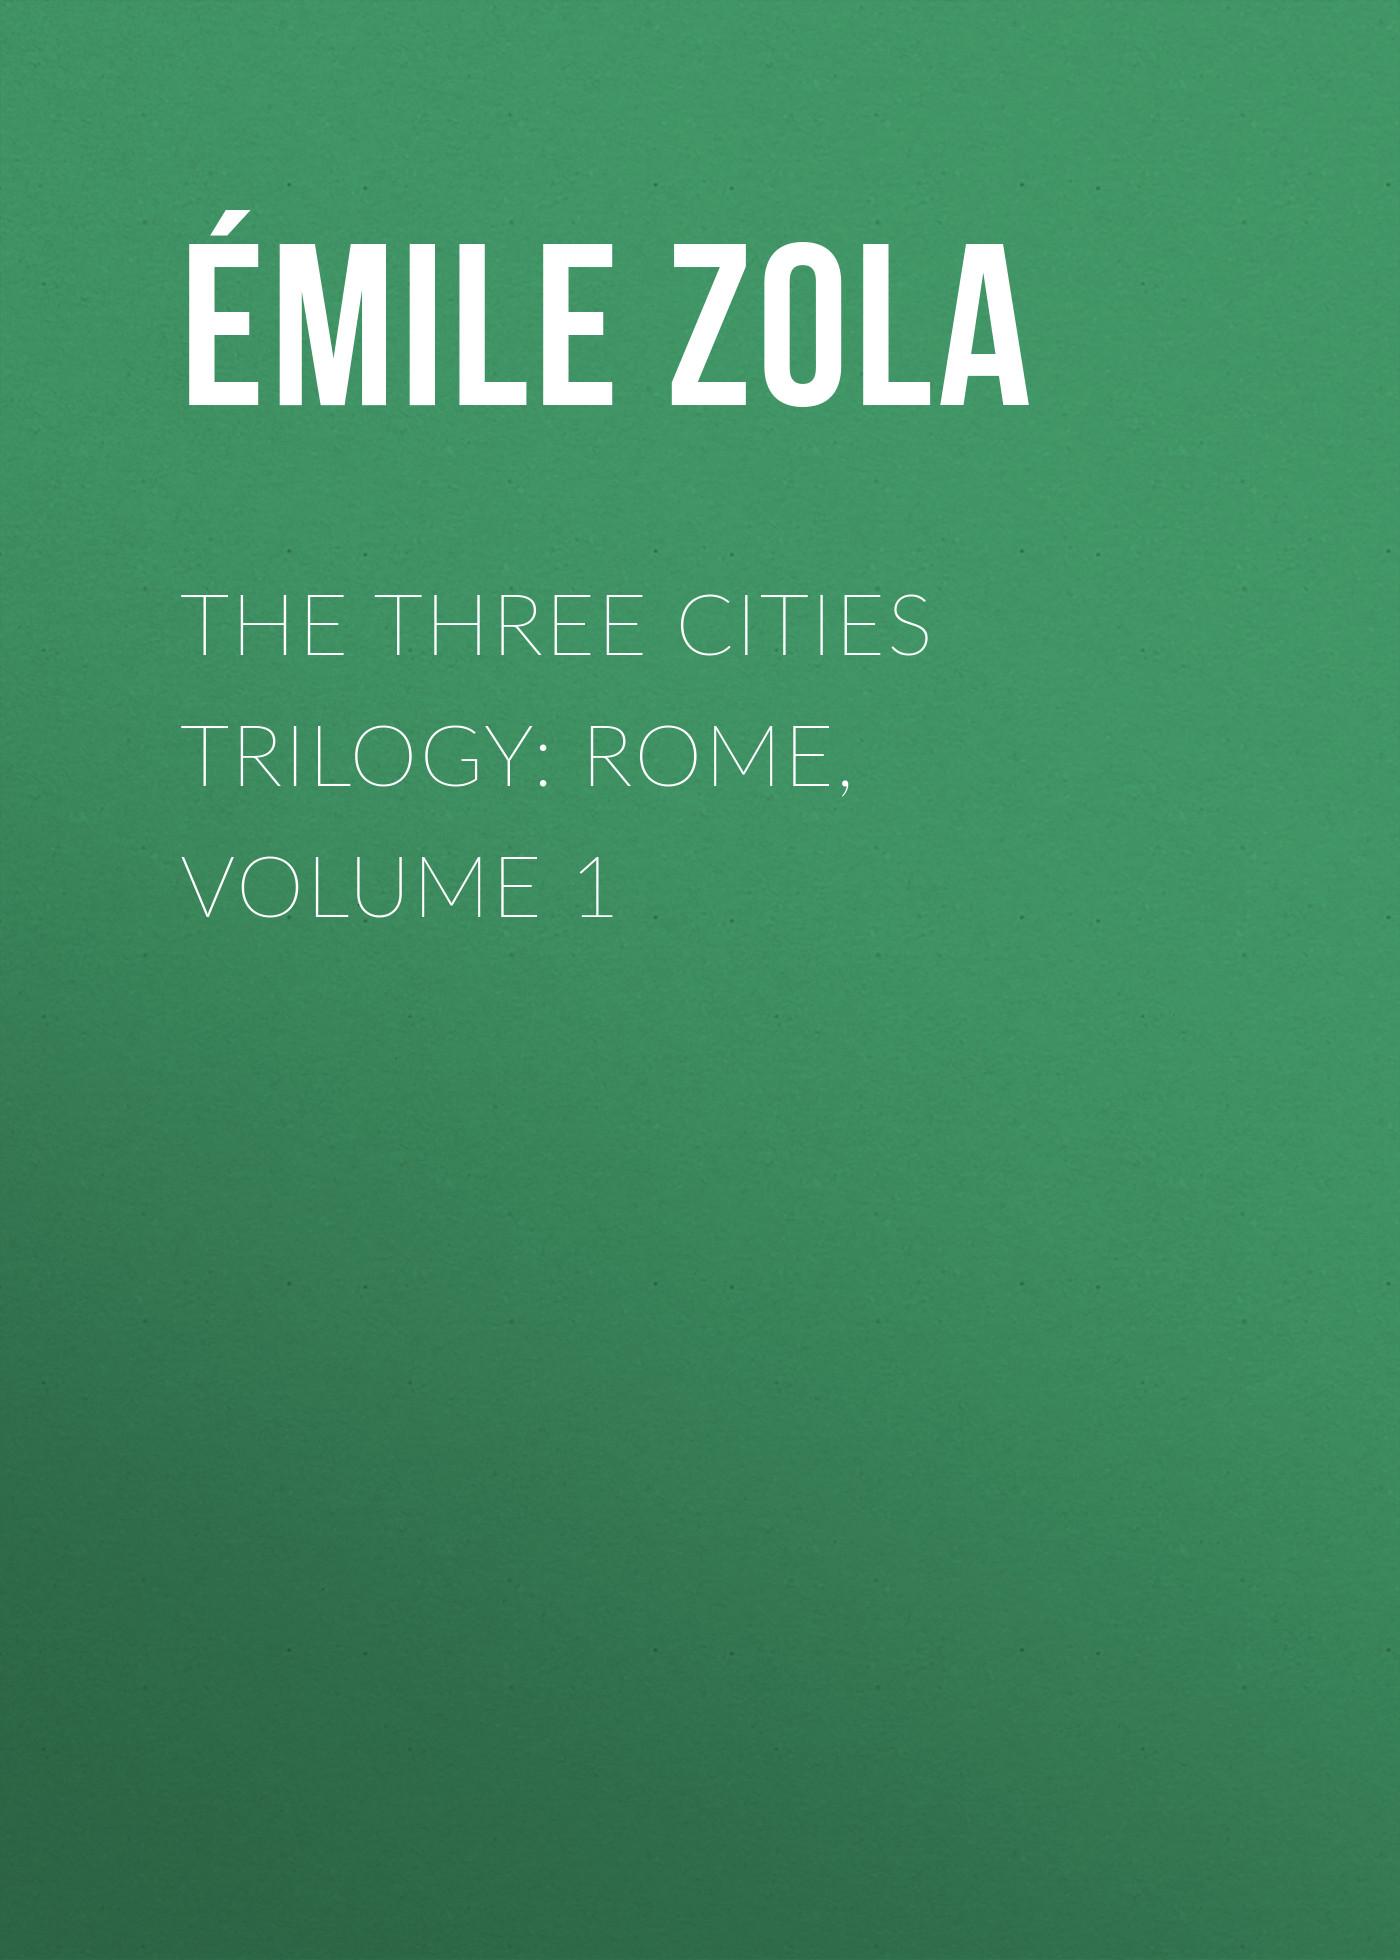 Эмиль Золя The Three Cities Trilogy: Rome, Volume 1 эмиль золя the three cities trilogy complete